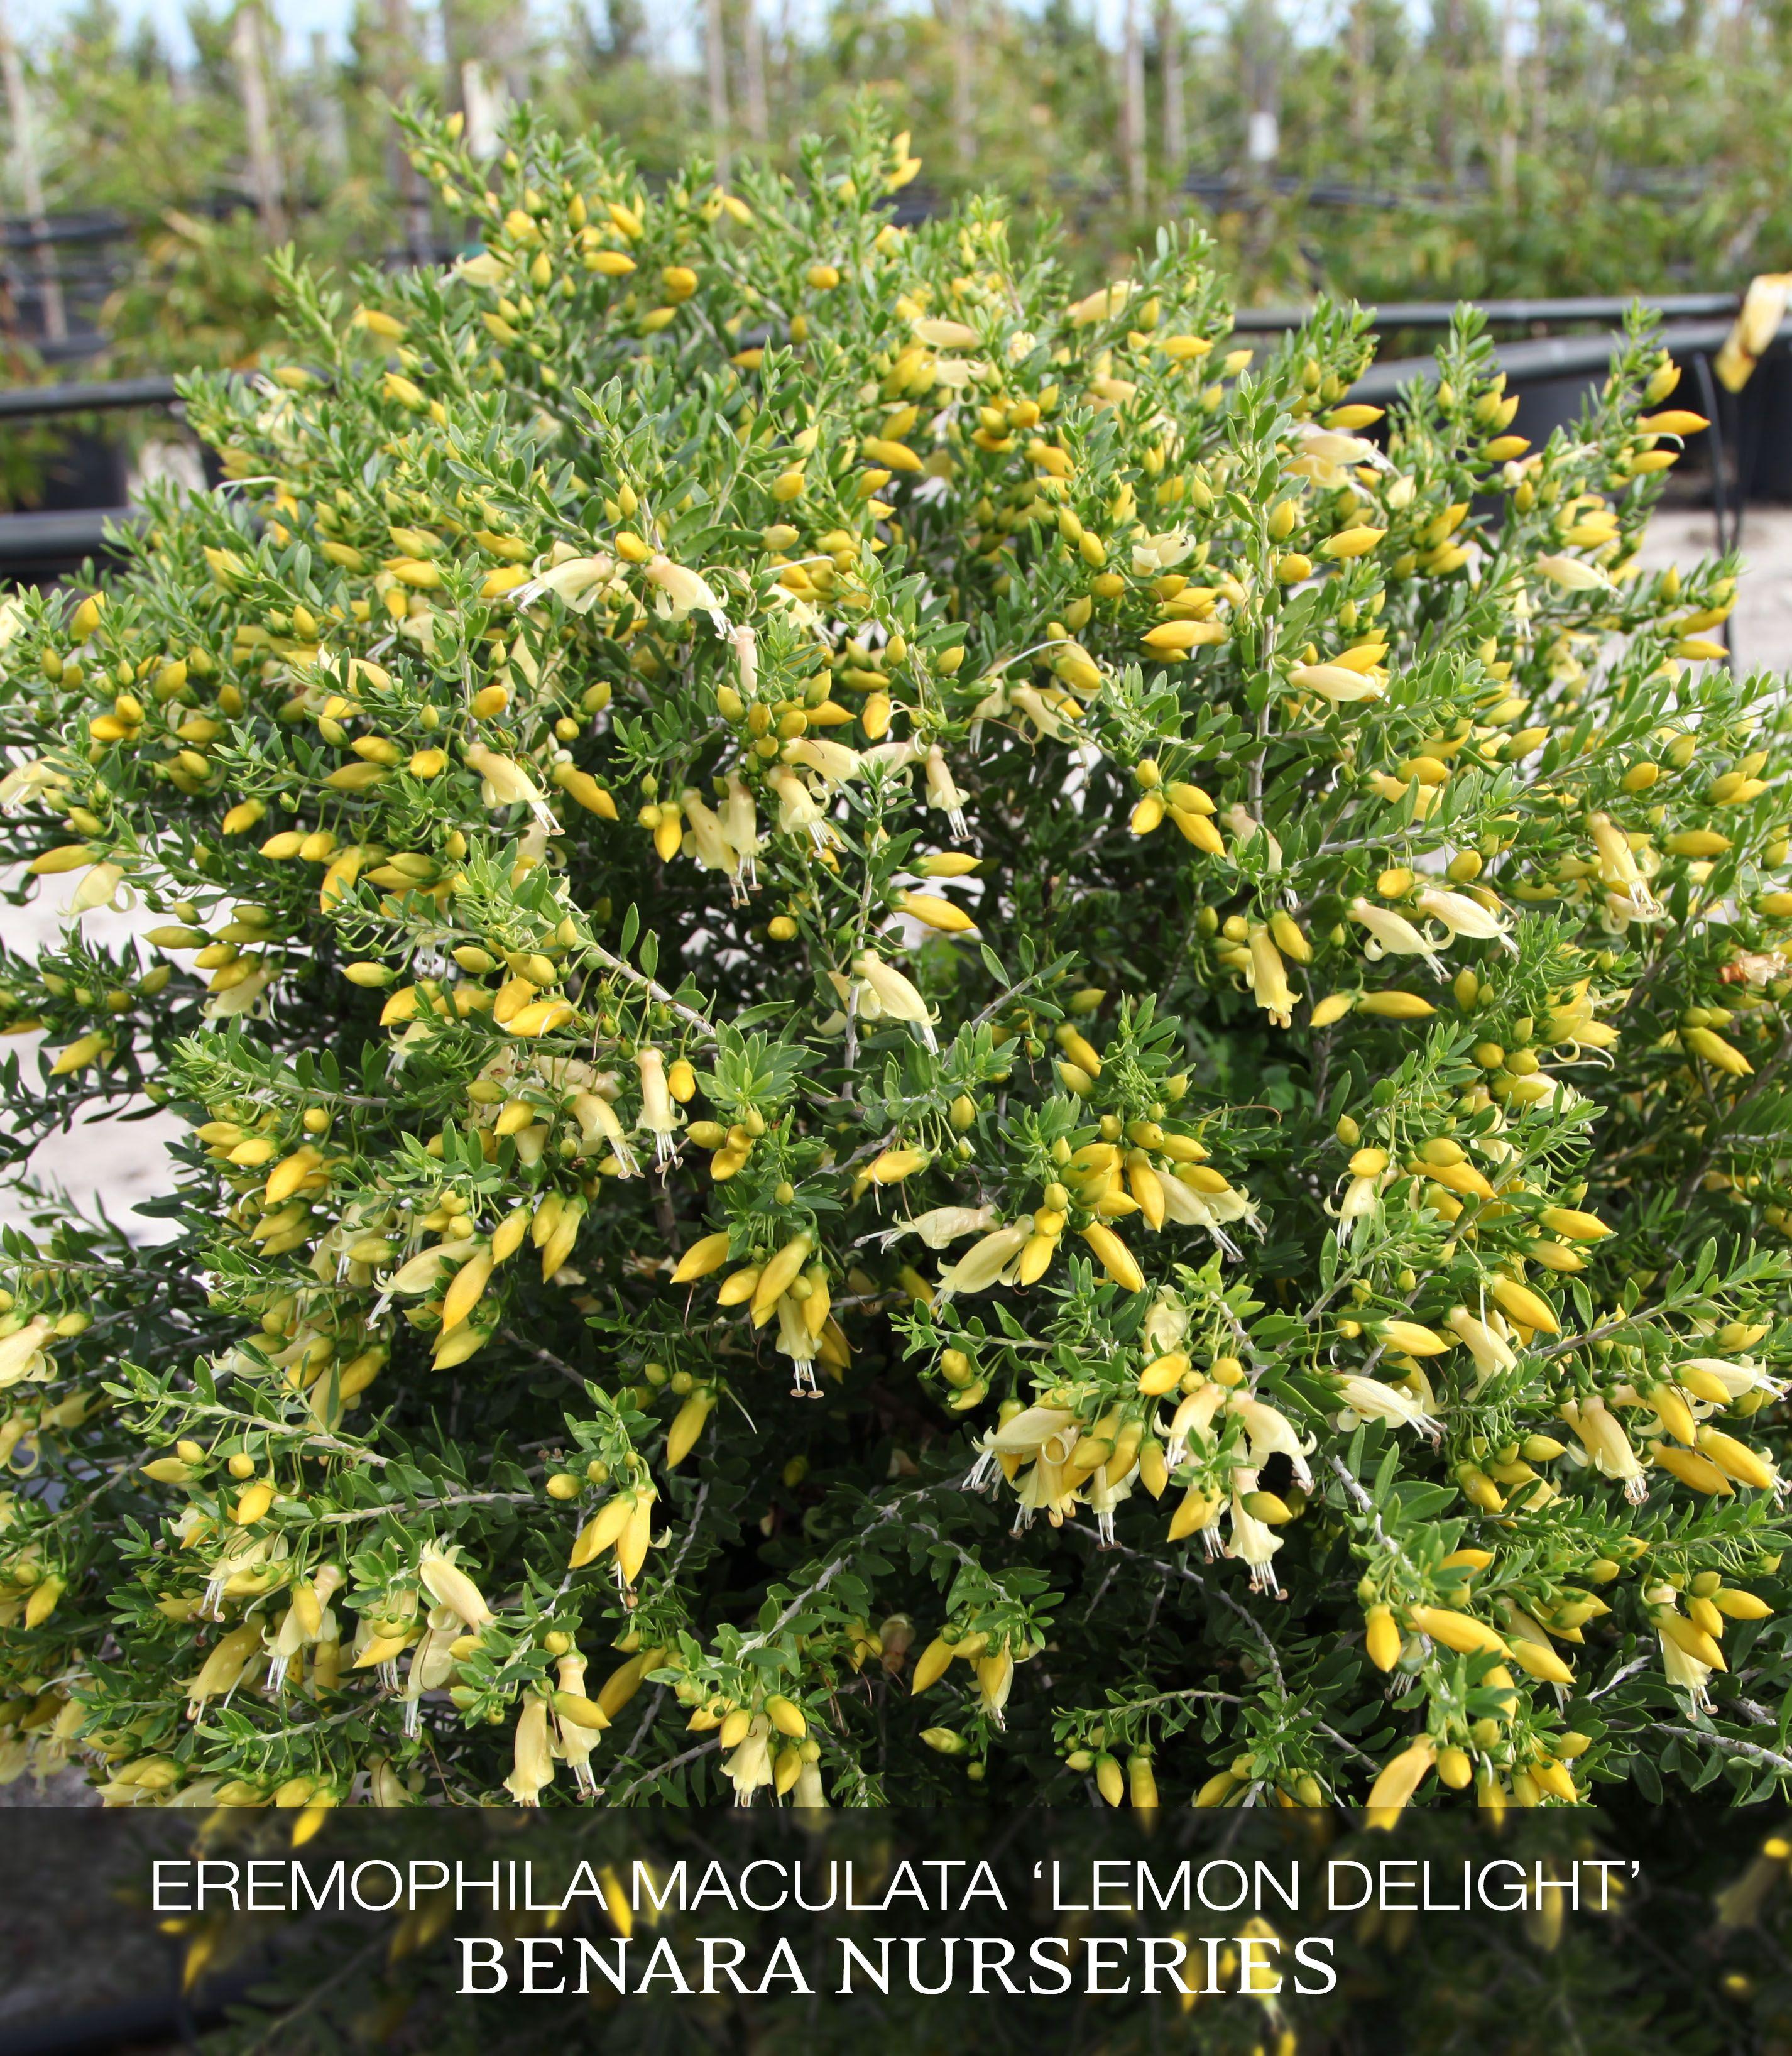 Eremophila maculata lemon delight july 2015 feature for Garden features australia